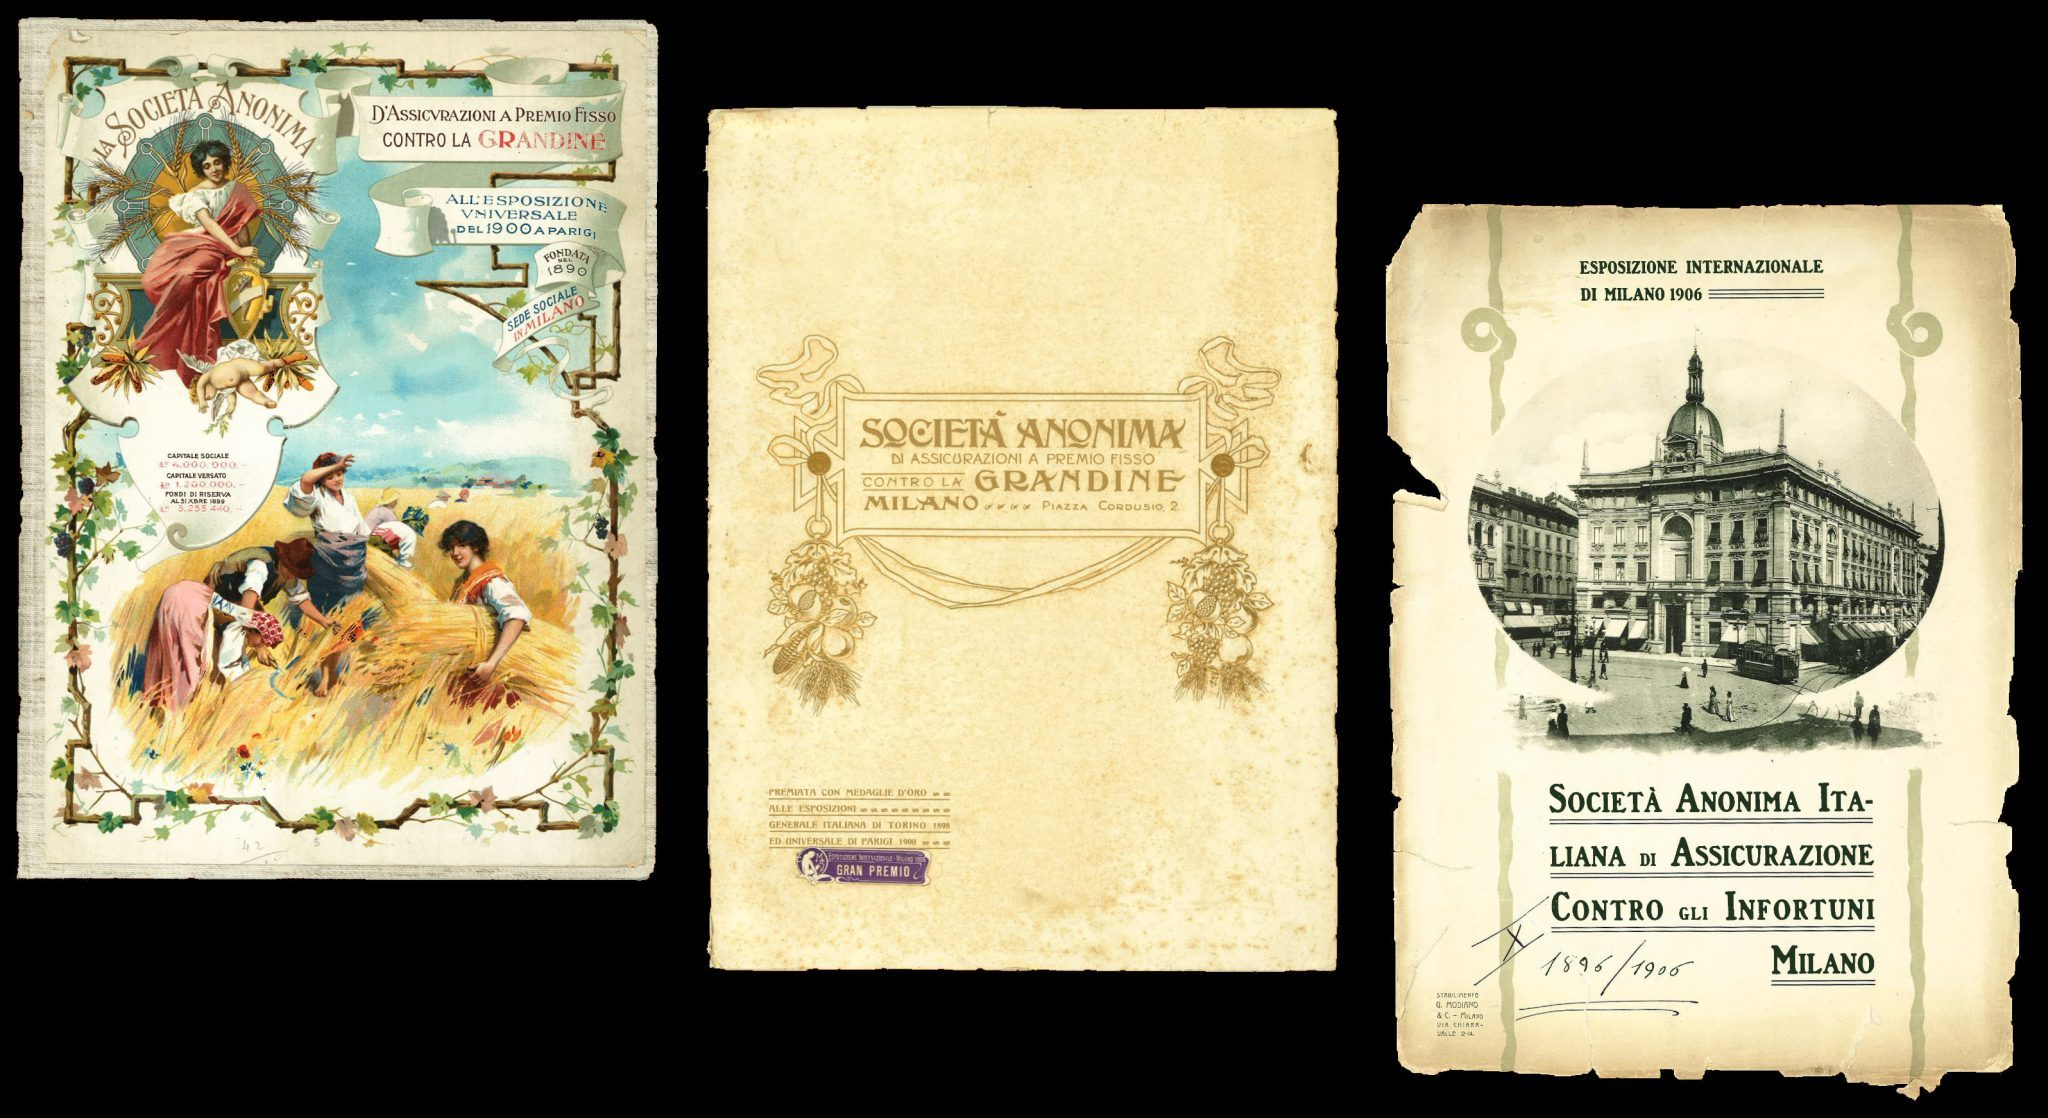 Memorie 1884, 1900, 1906